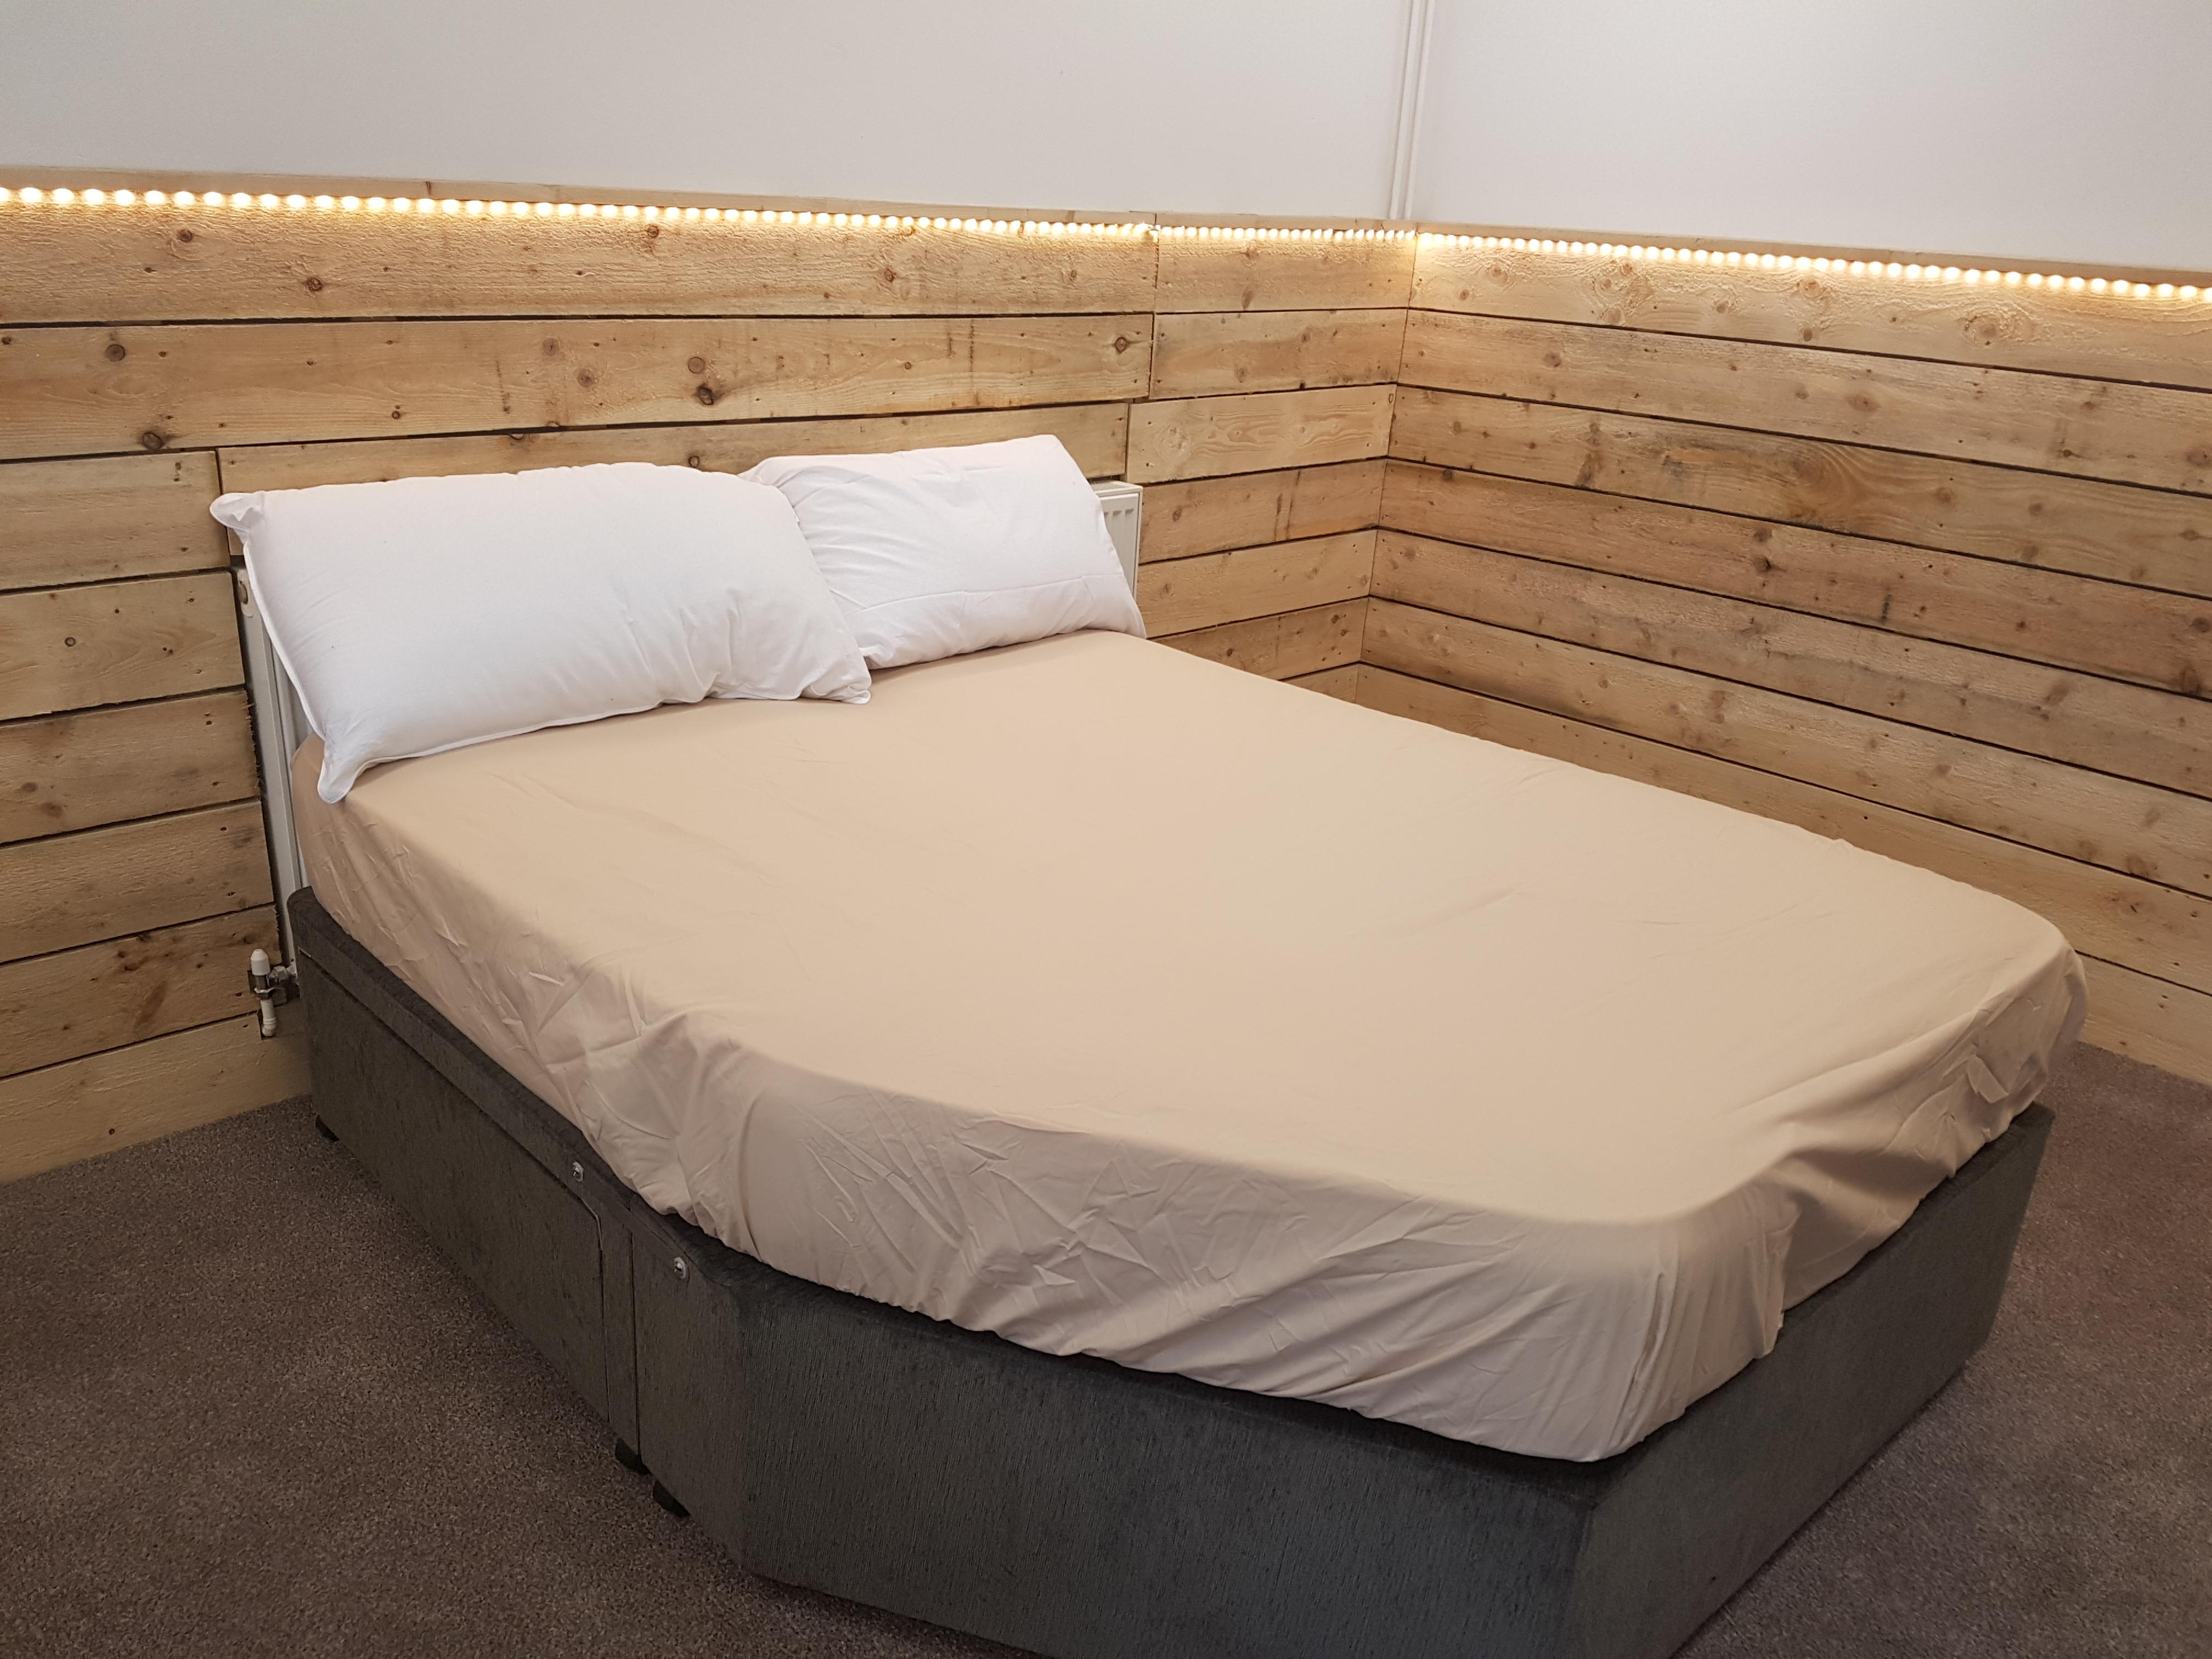 coachman vision fitted sheet cheap caravan mattresses. Black Bedroom Furniture Sets. Home Design Ideas